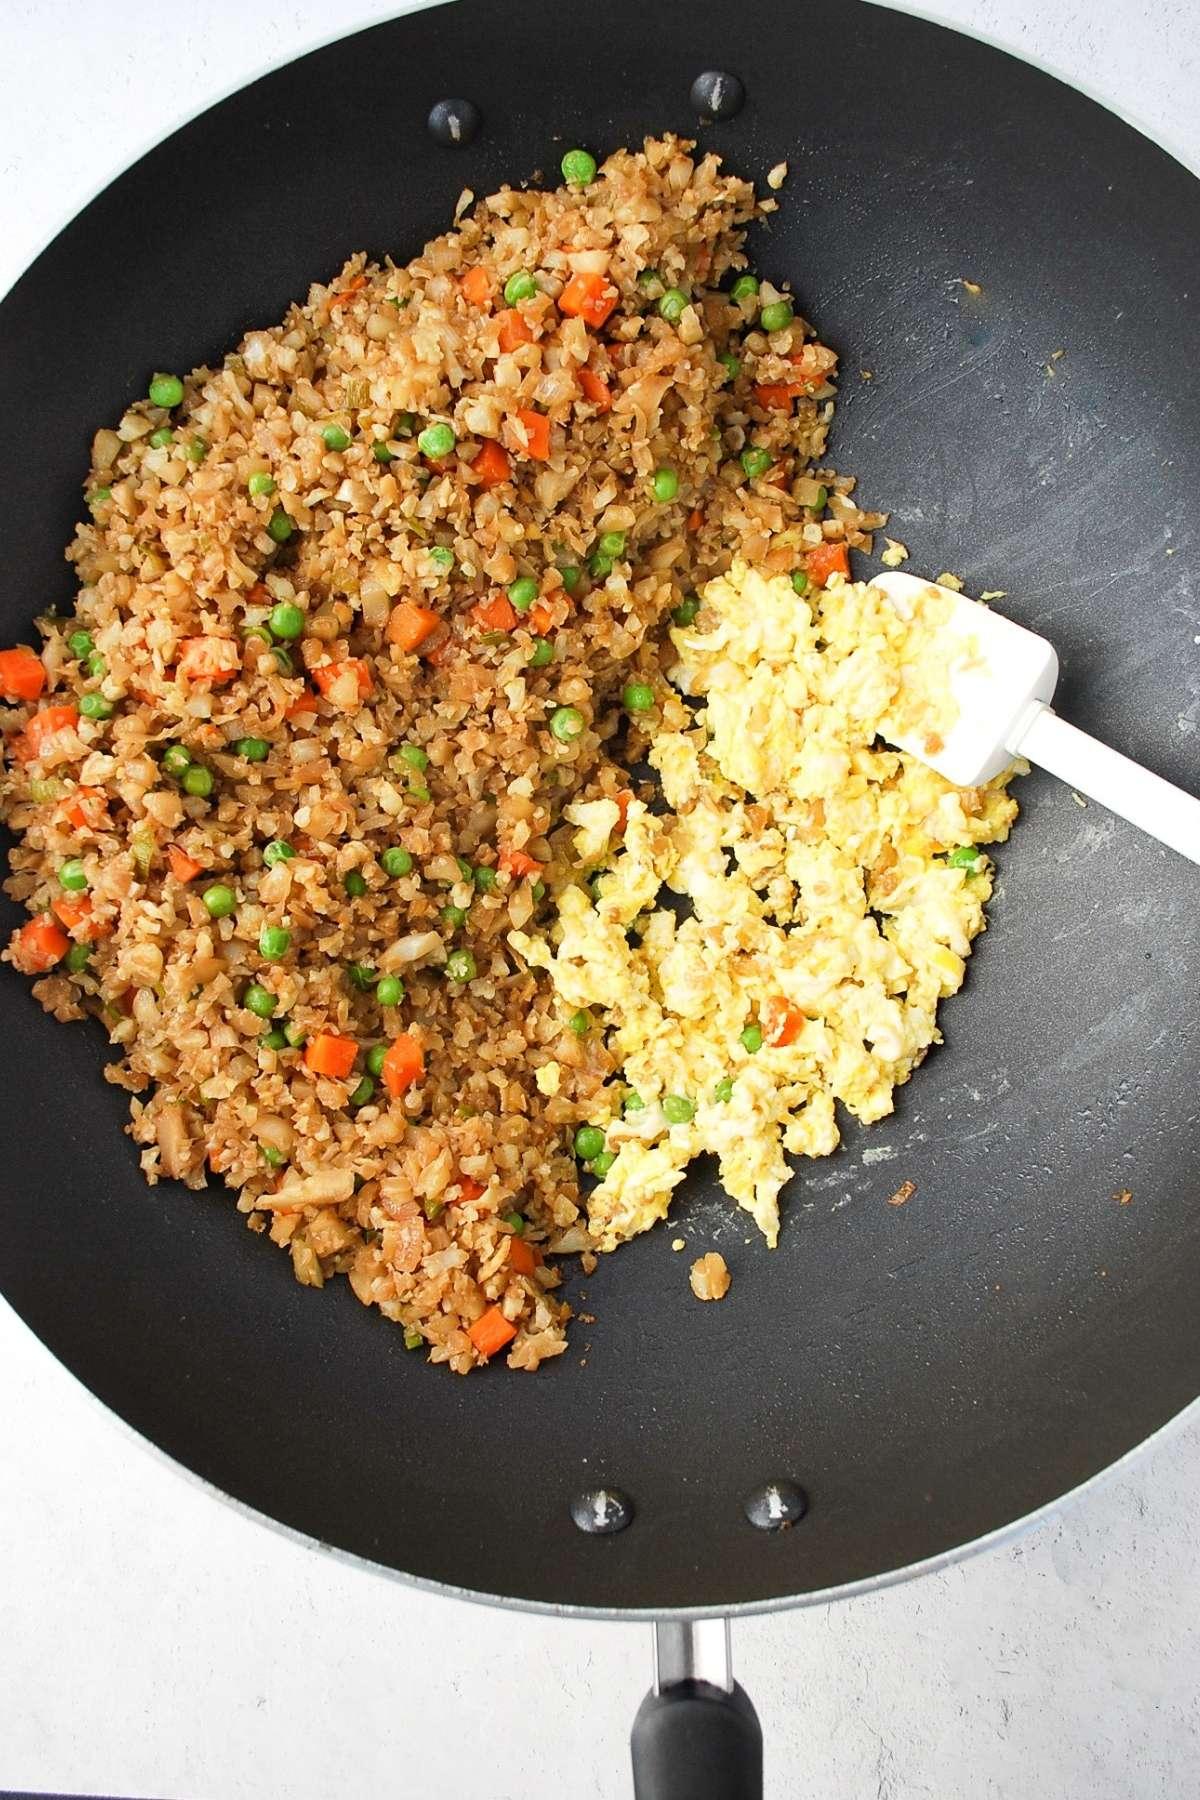 scrambling eggs next to cauliflower fried rice in a wok